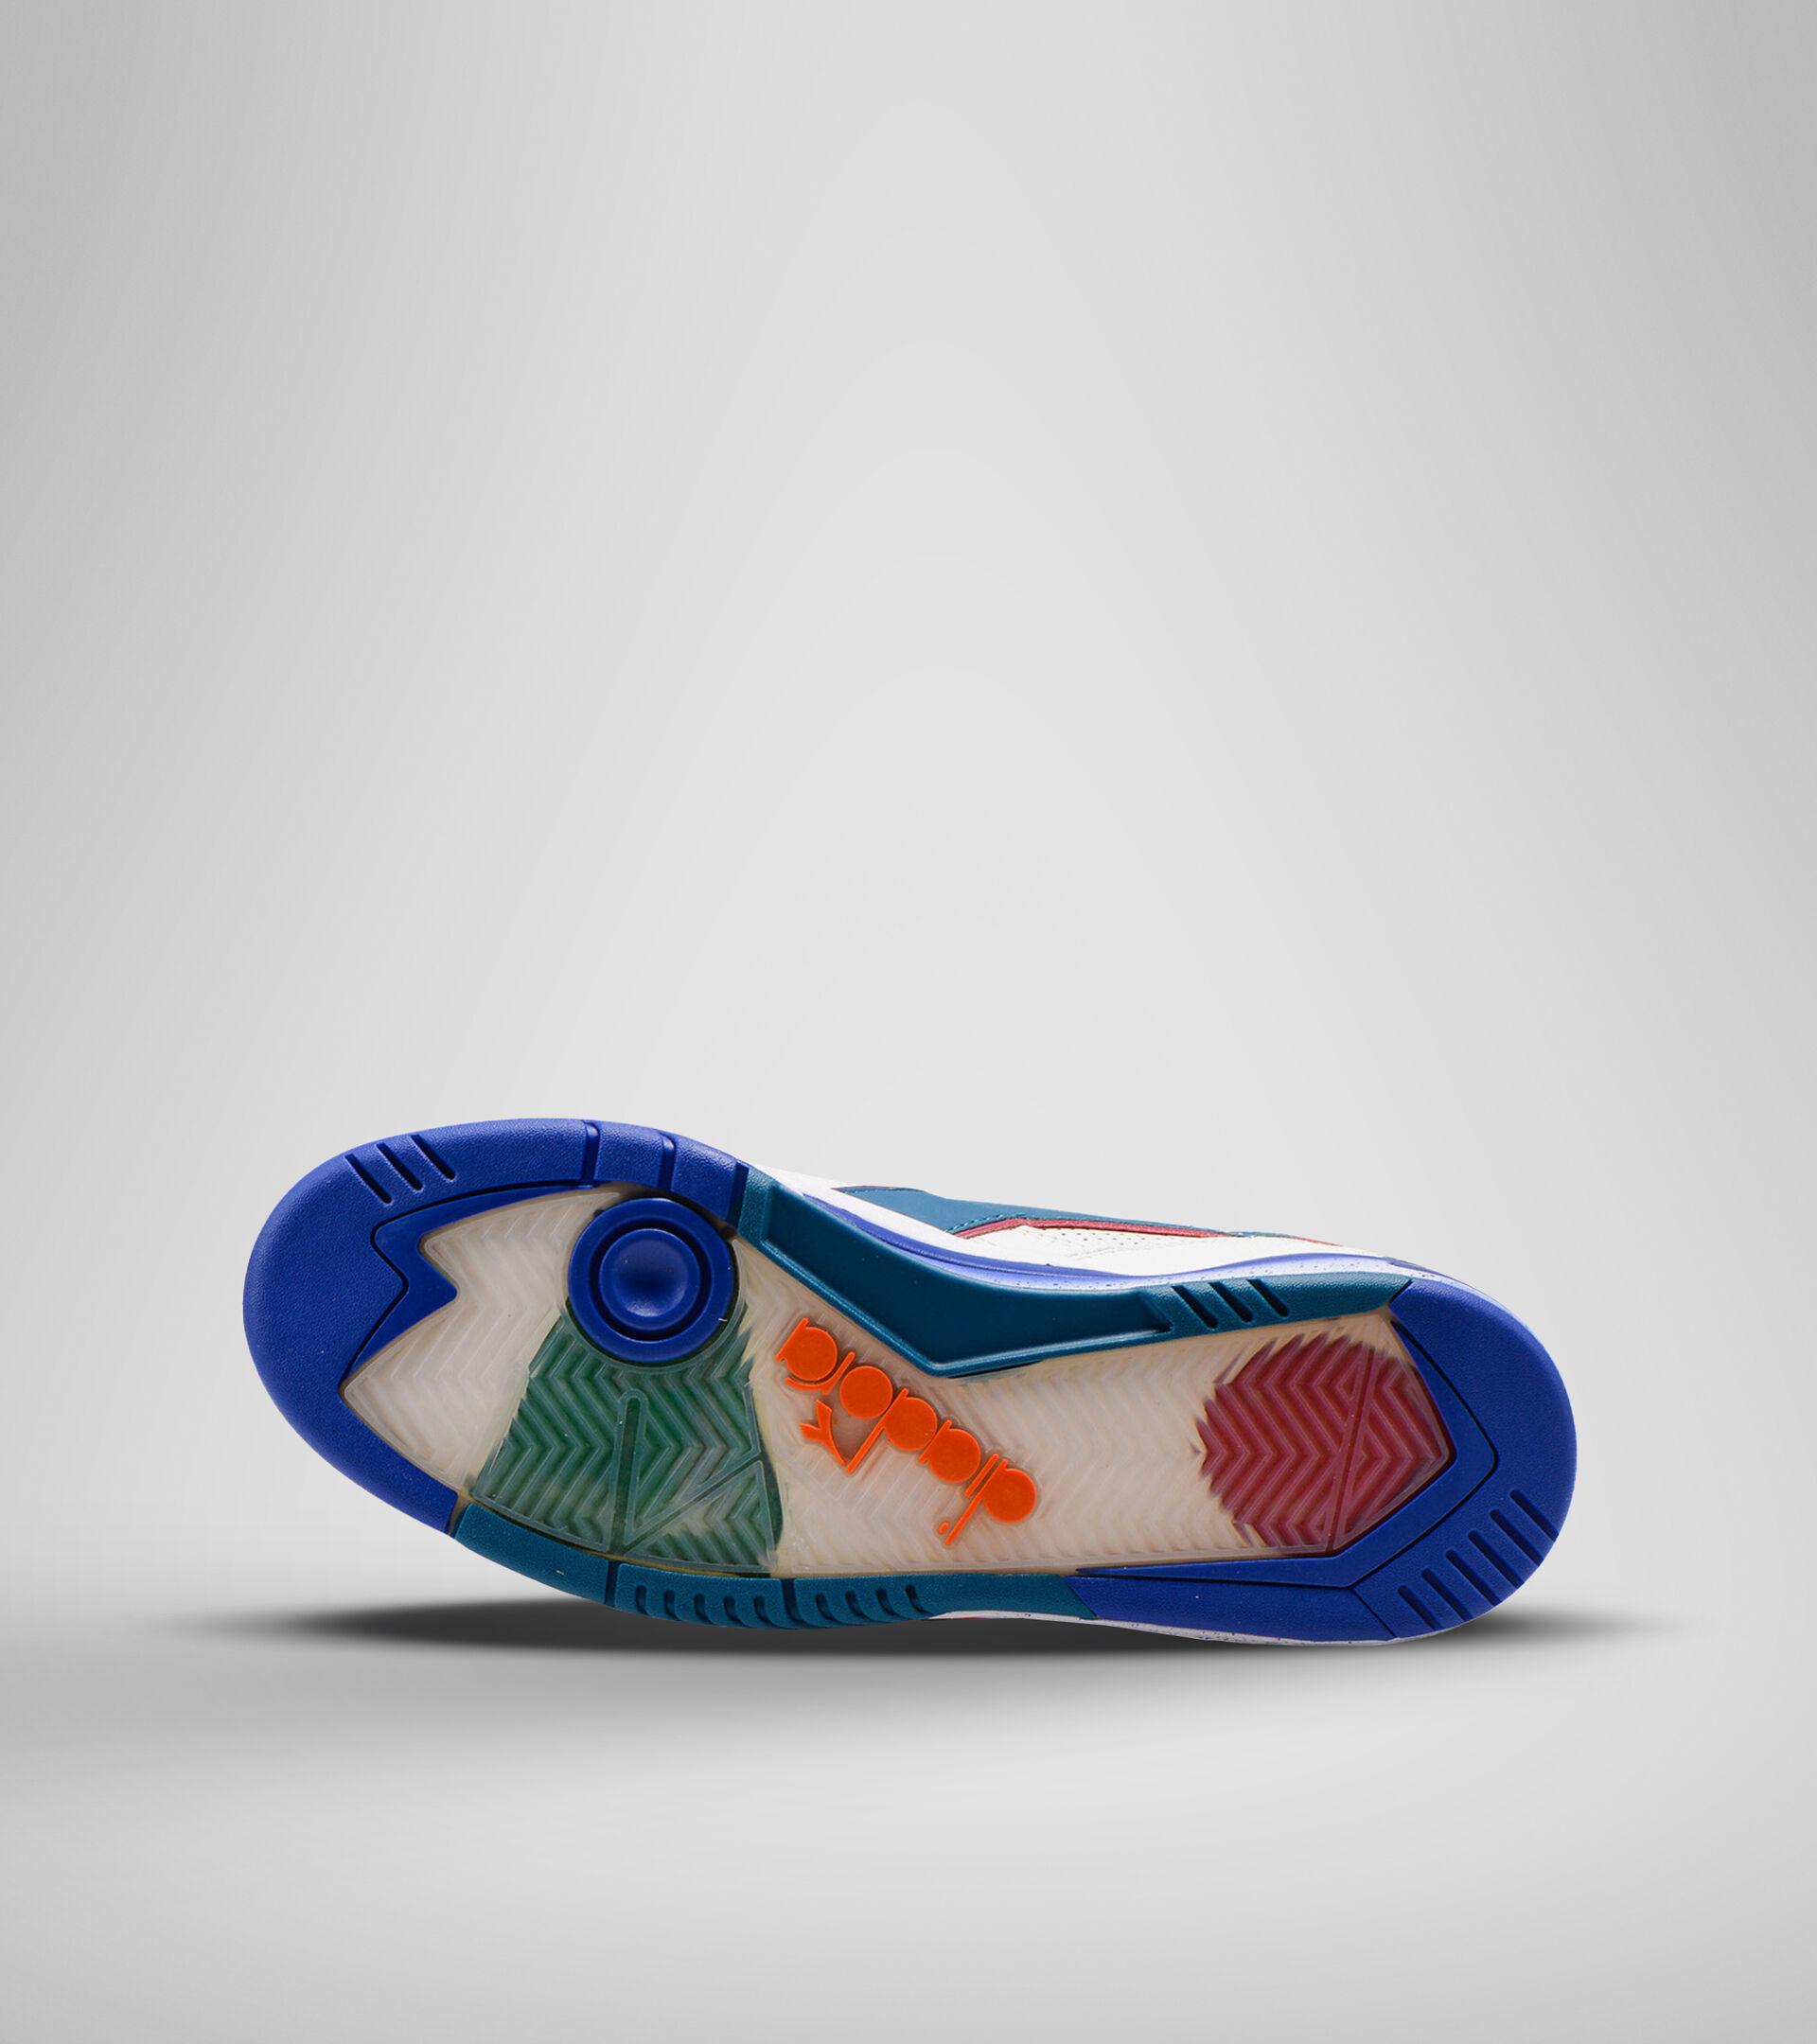 Footwear Sportswear UNISEX REBOUND ACE IMPERIAL BLUE/WHITE Diadora